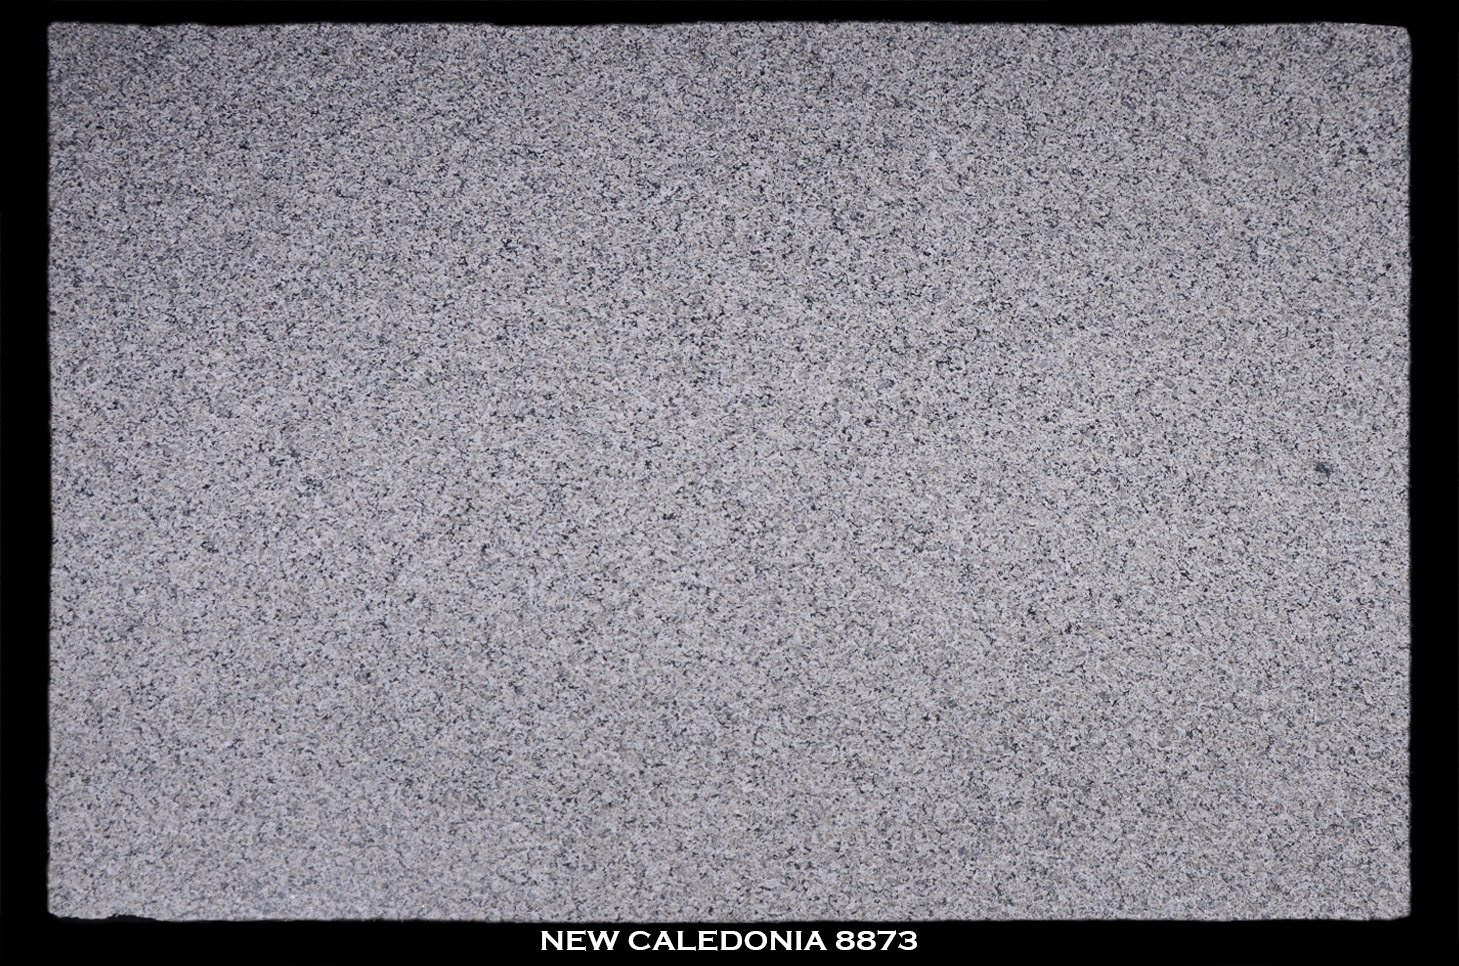 NEW-CALEDONIA-8873-SLAB